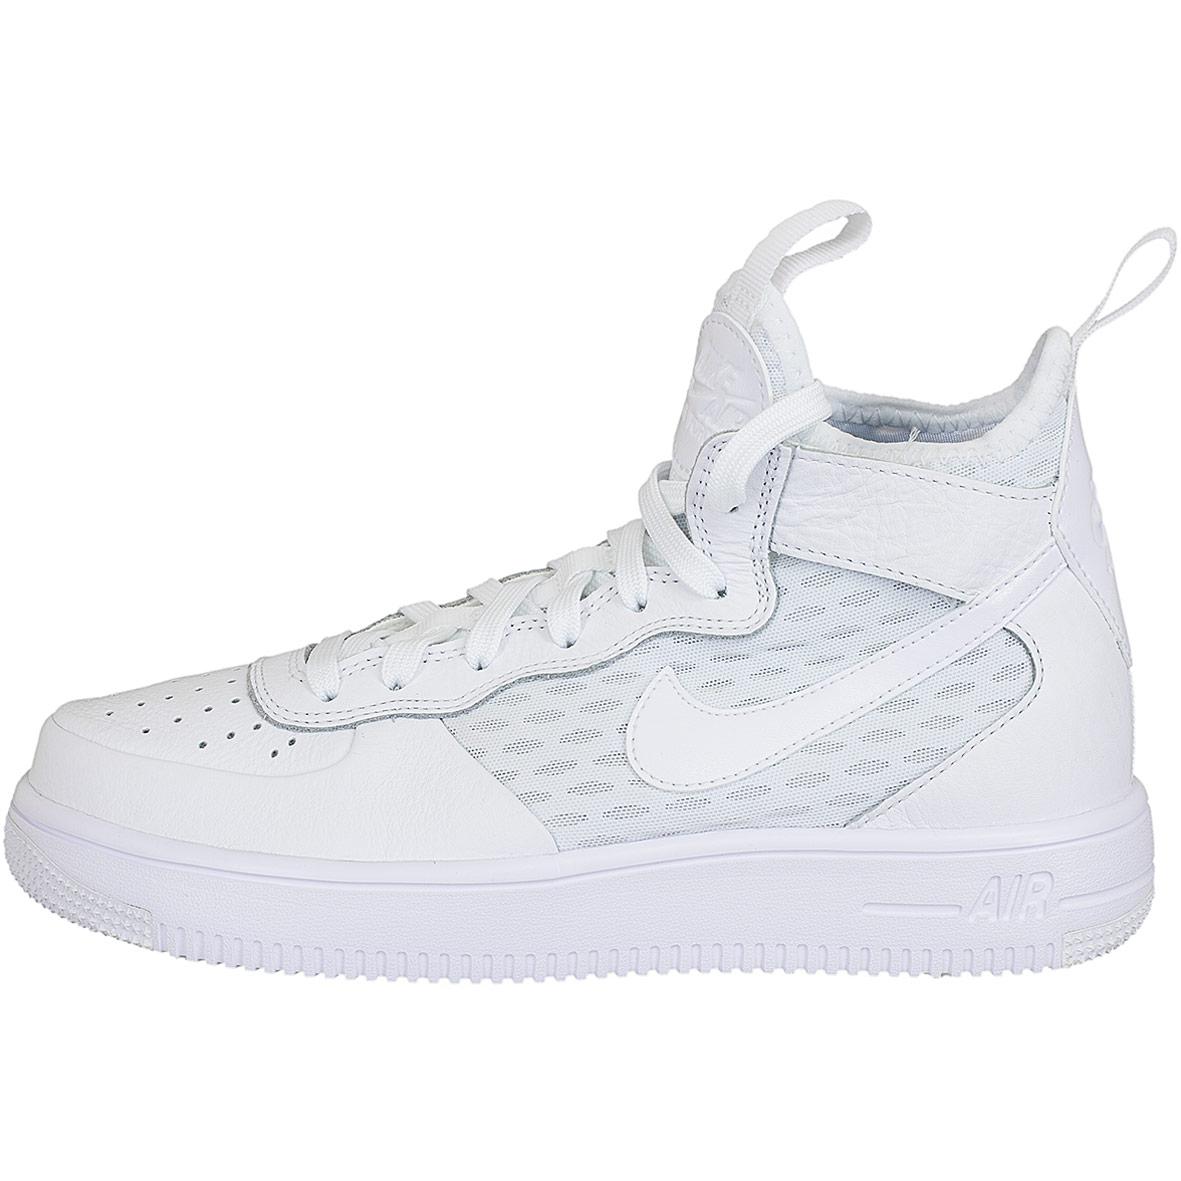 nike damen sneaker air force 1 ultraforce mid wei wei. Black Bedroom Furniture Sets. Home Design Ideas